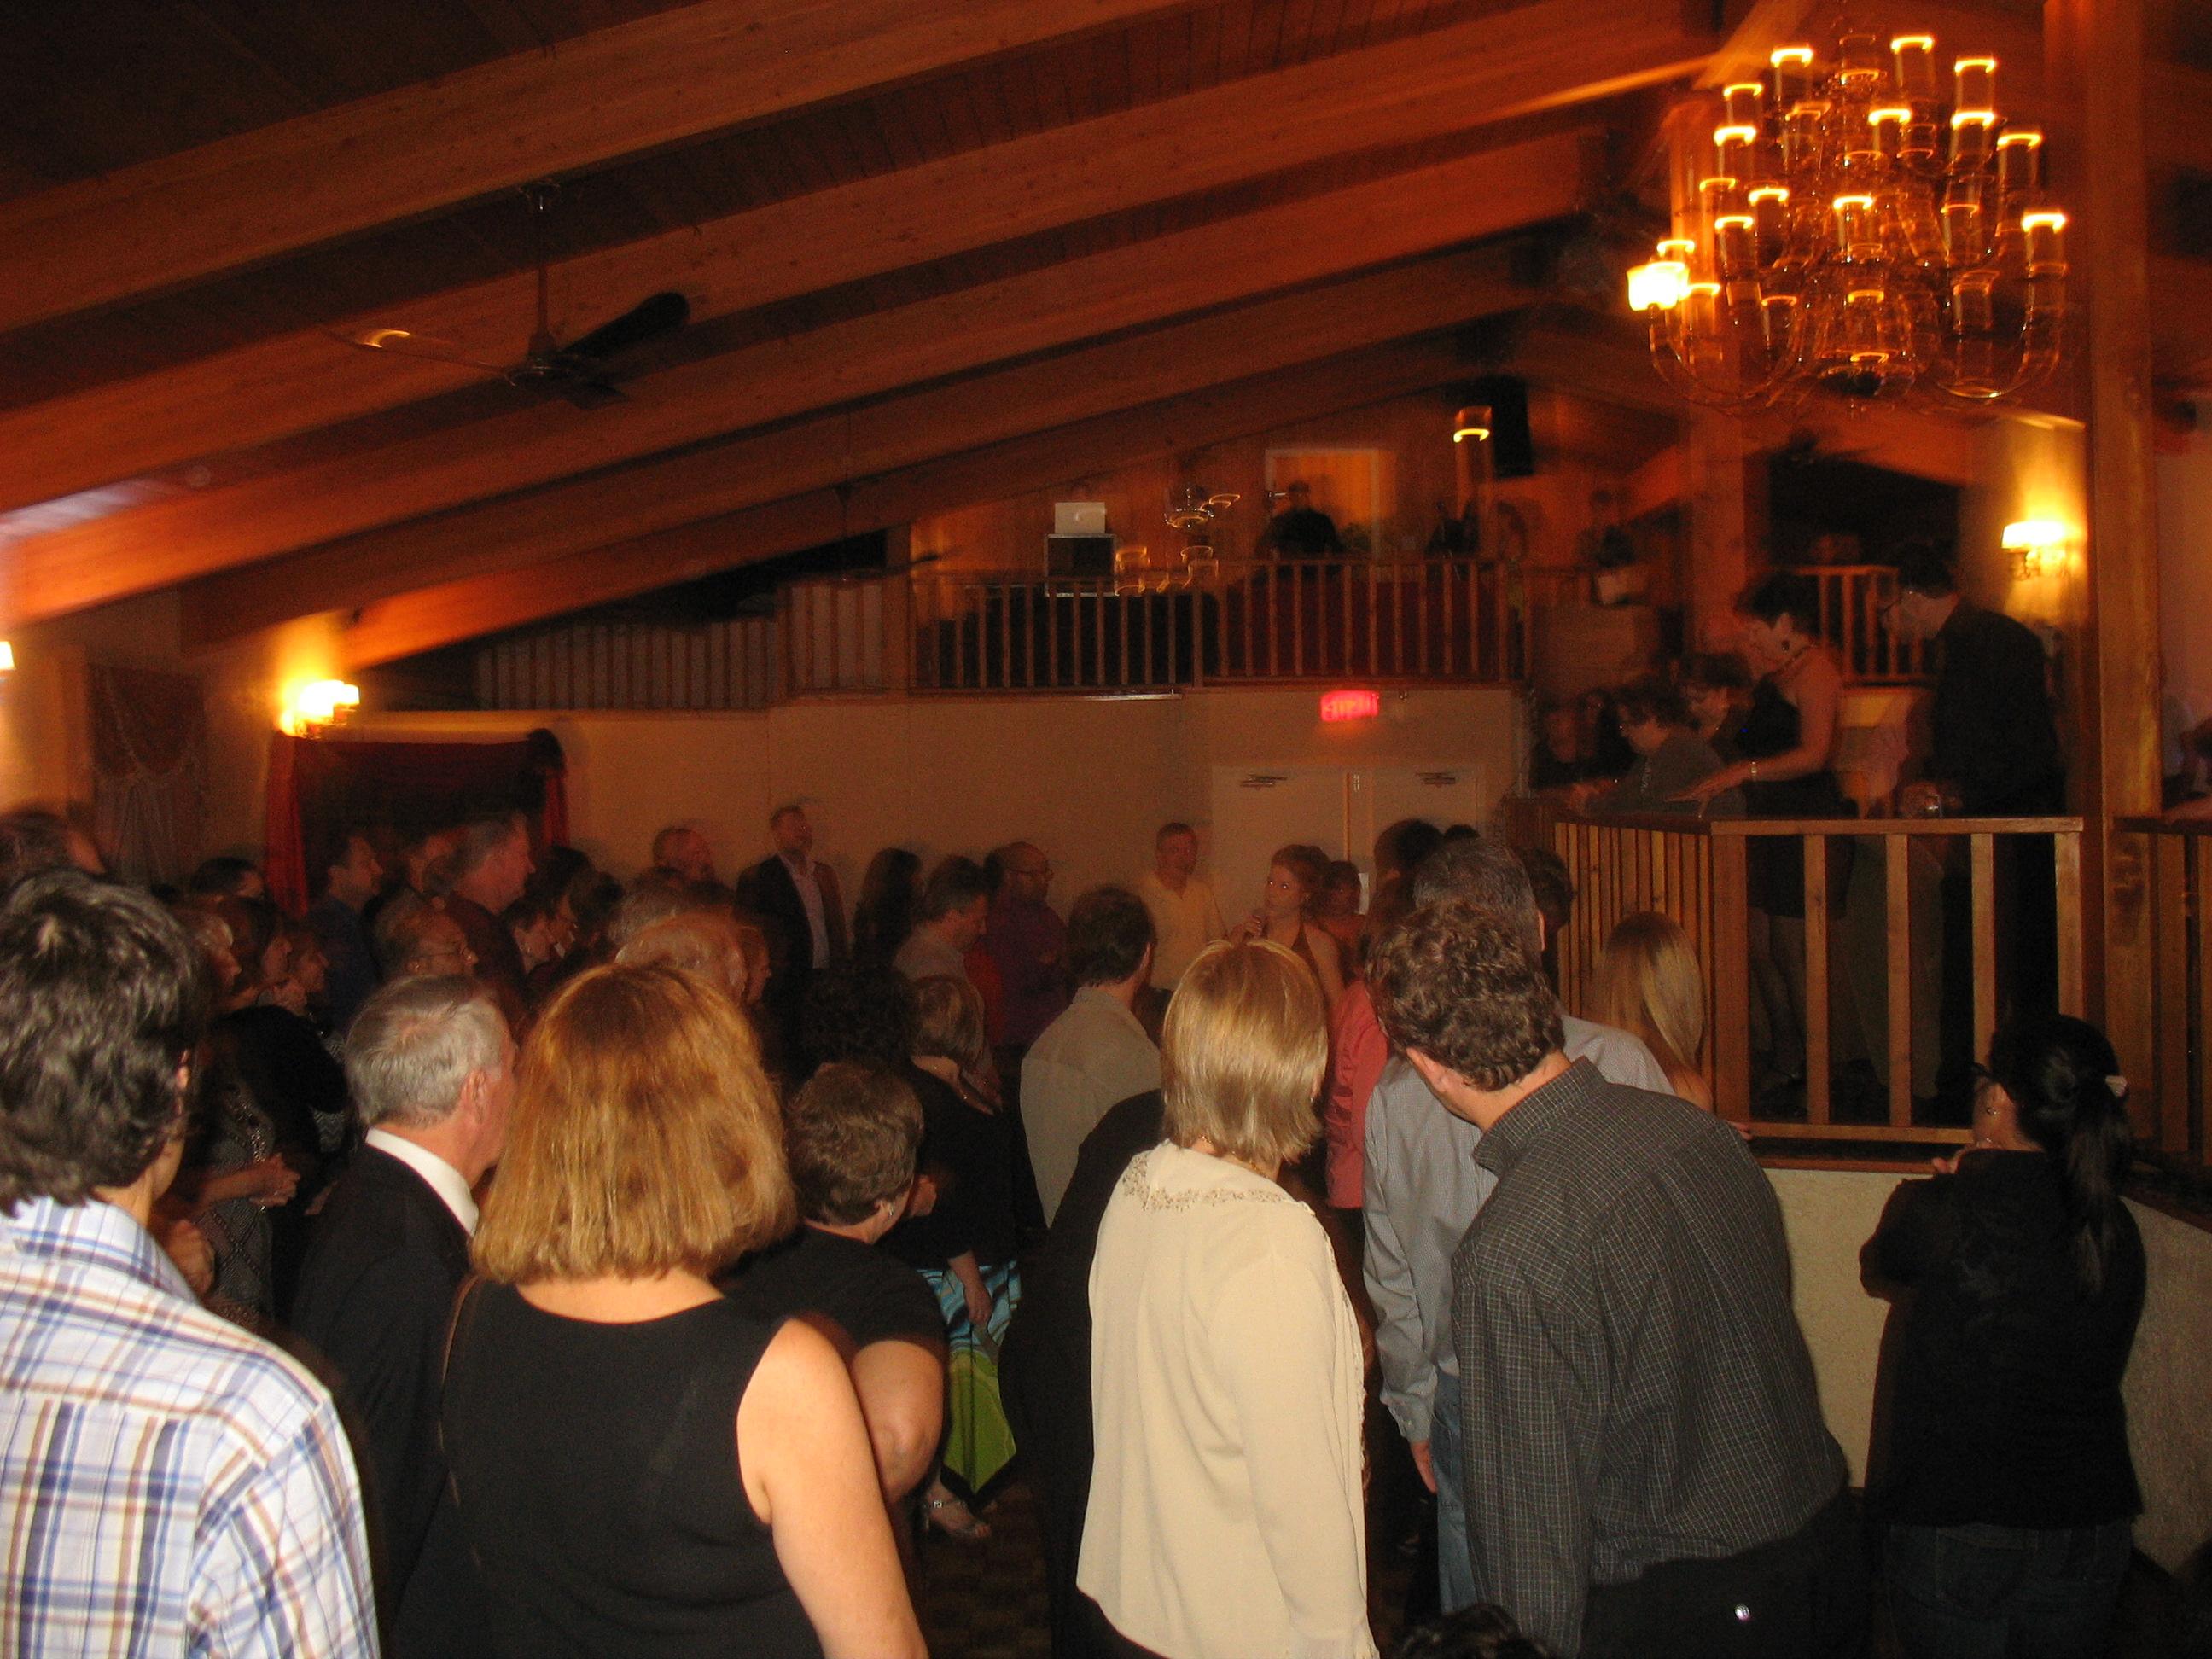 danceScape Social Dance Club – Ballroom, Salsa/Latin, Swing/Jive, Lindy Hop, Practice Parties